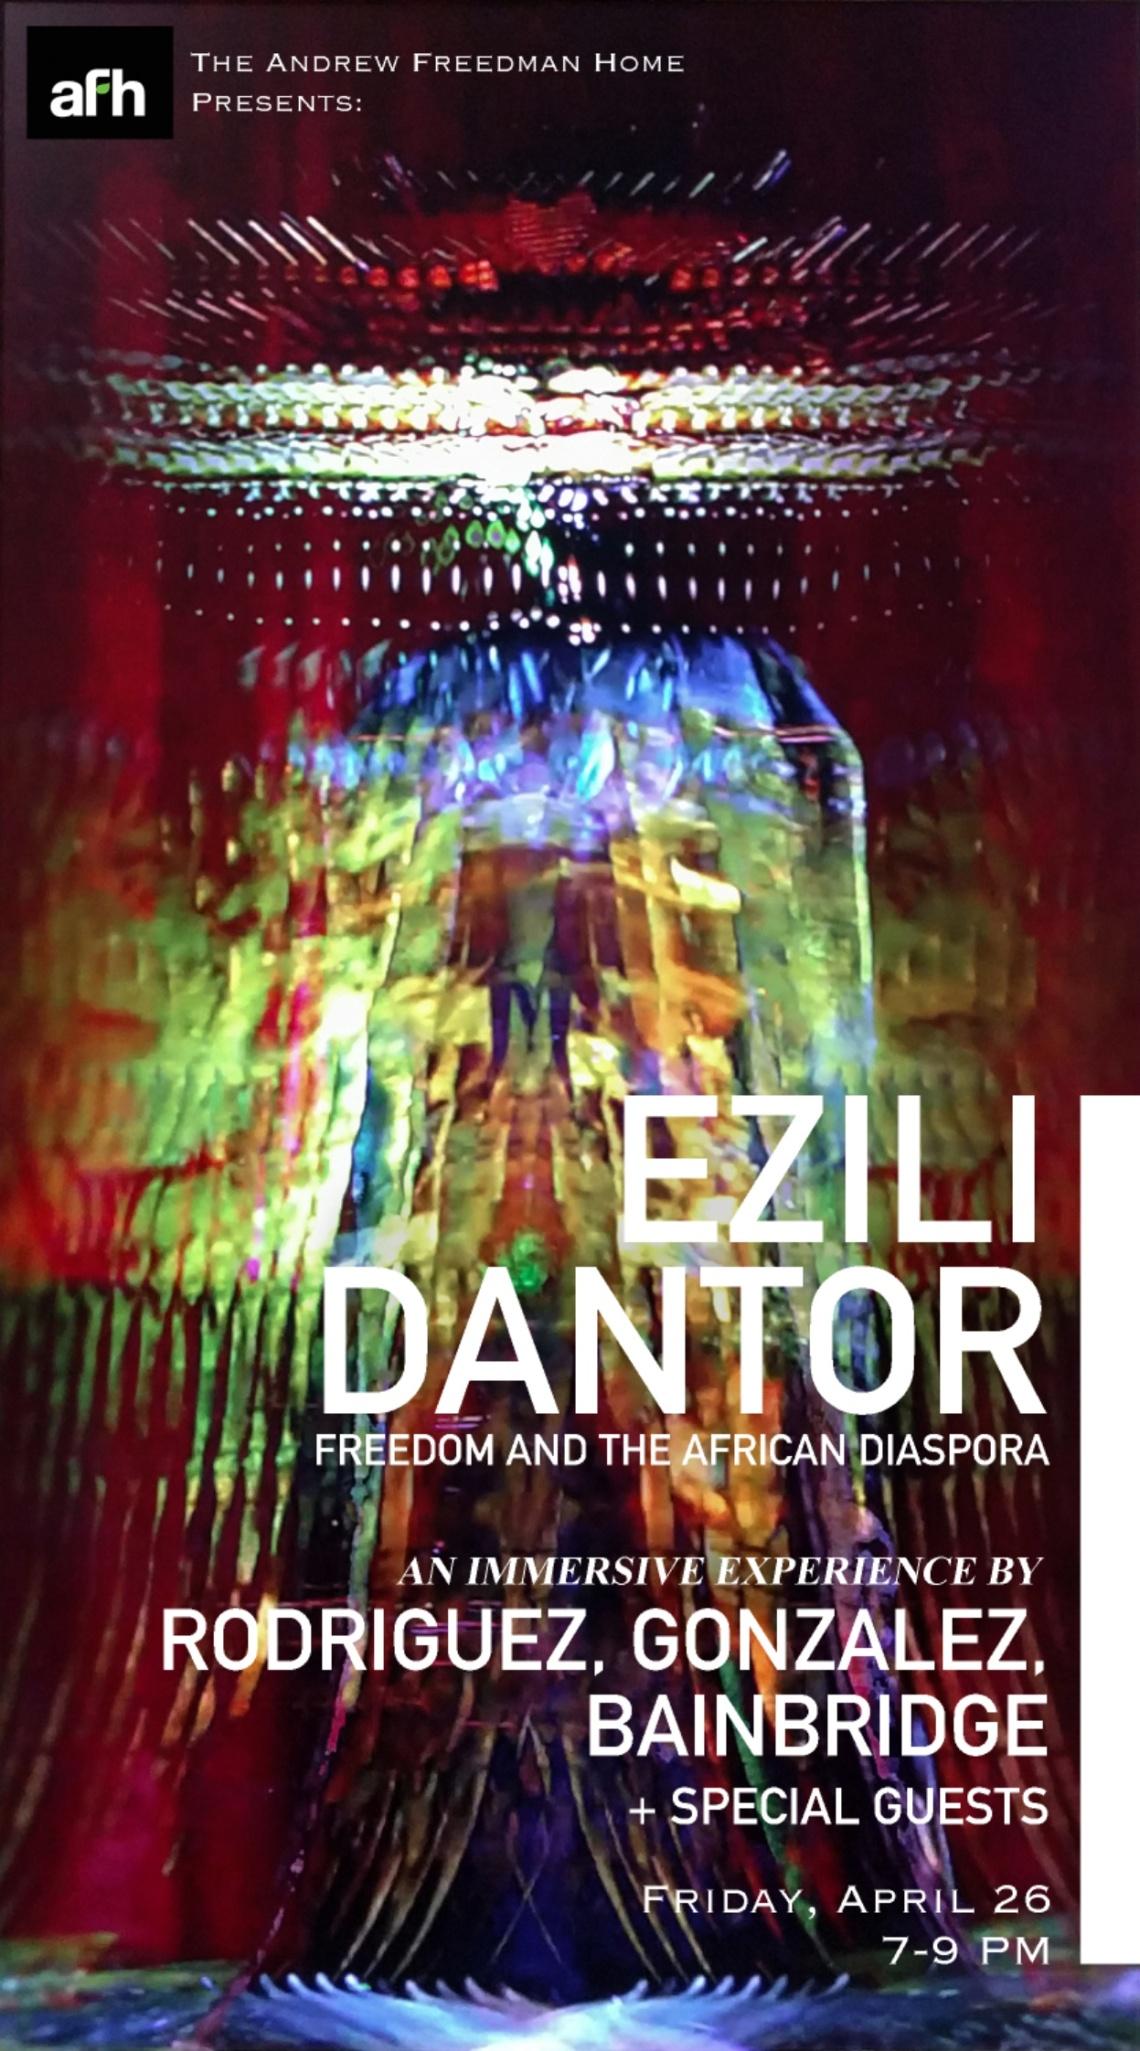 Rodriguez, Gonzalez, Bainbridge- Ezili Dantor at AFH poster_resized